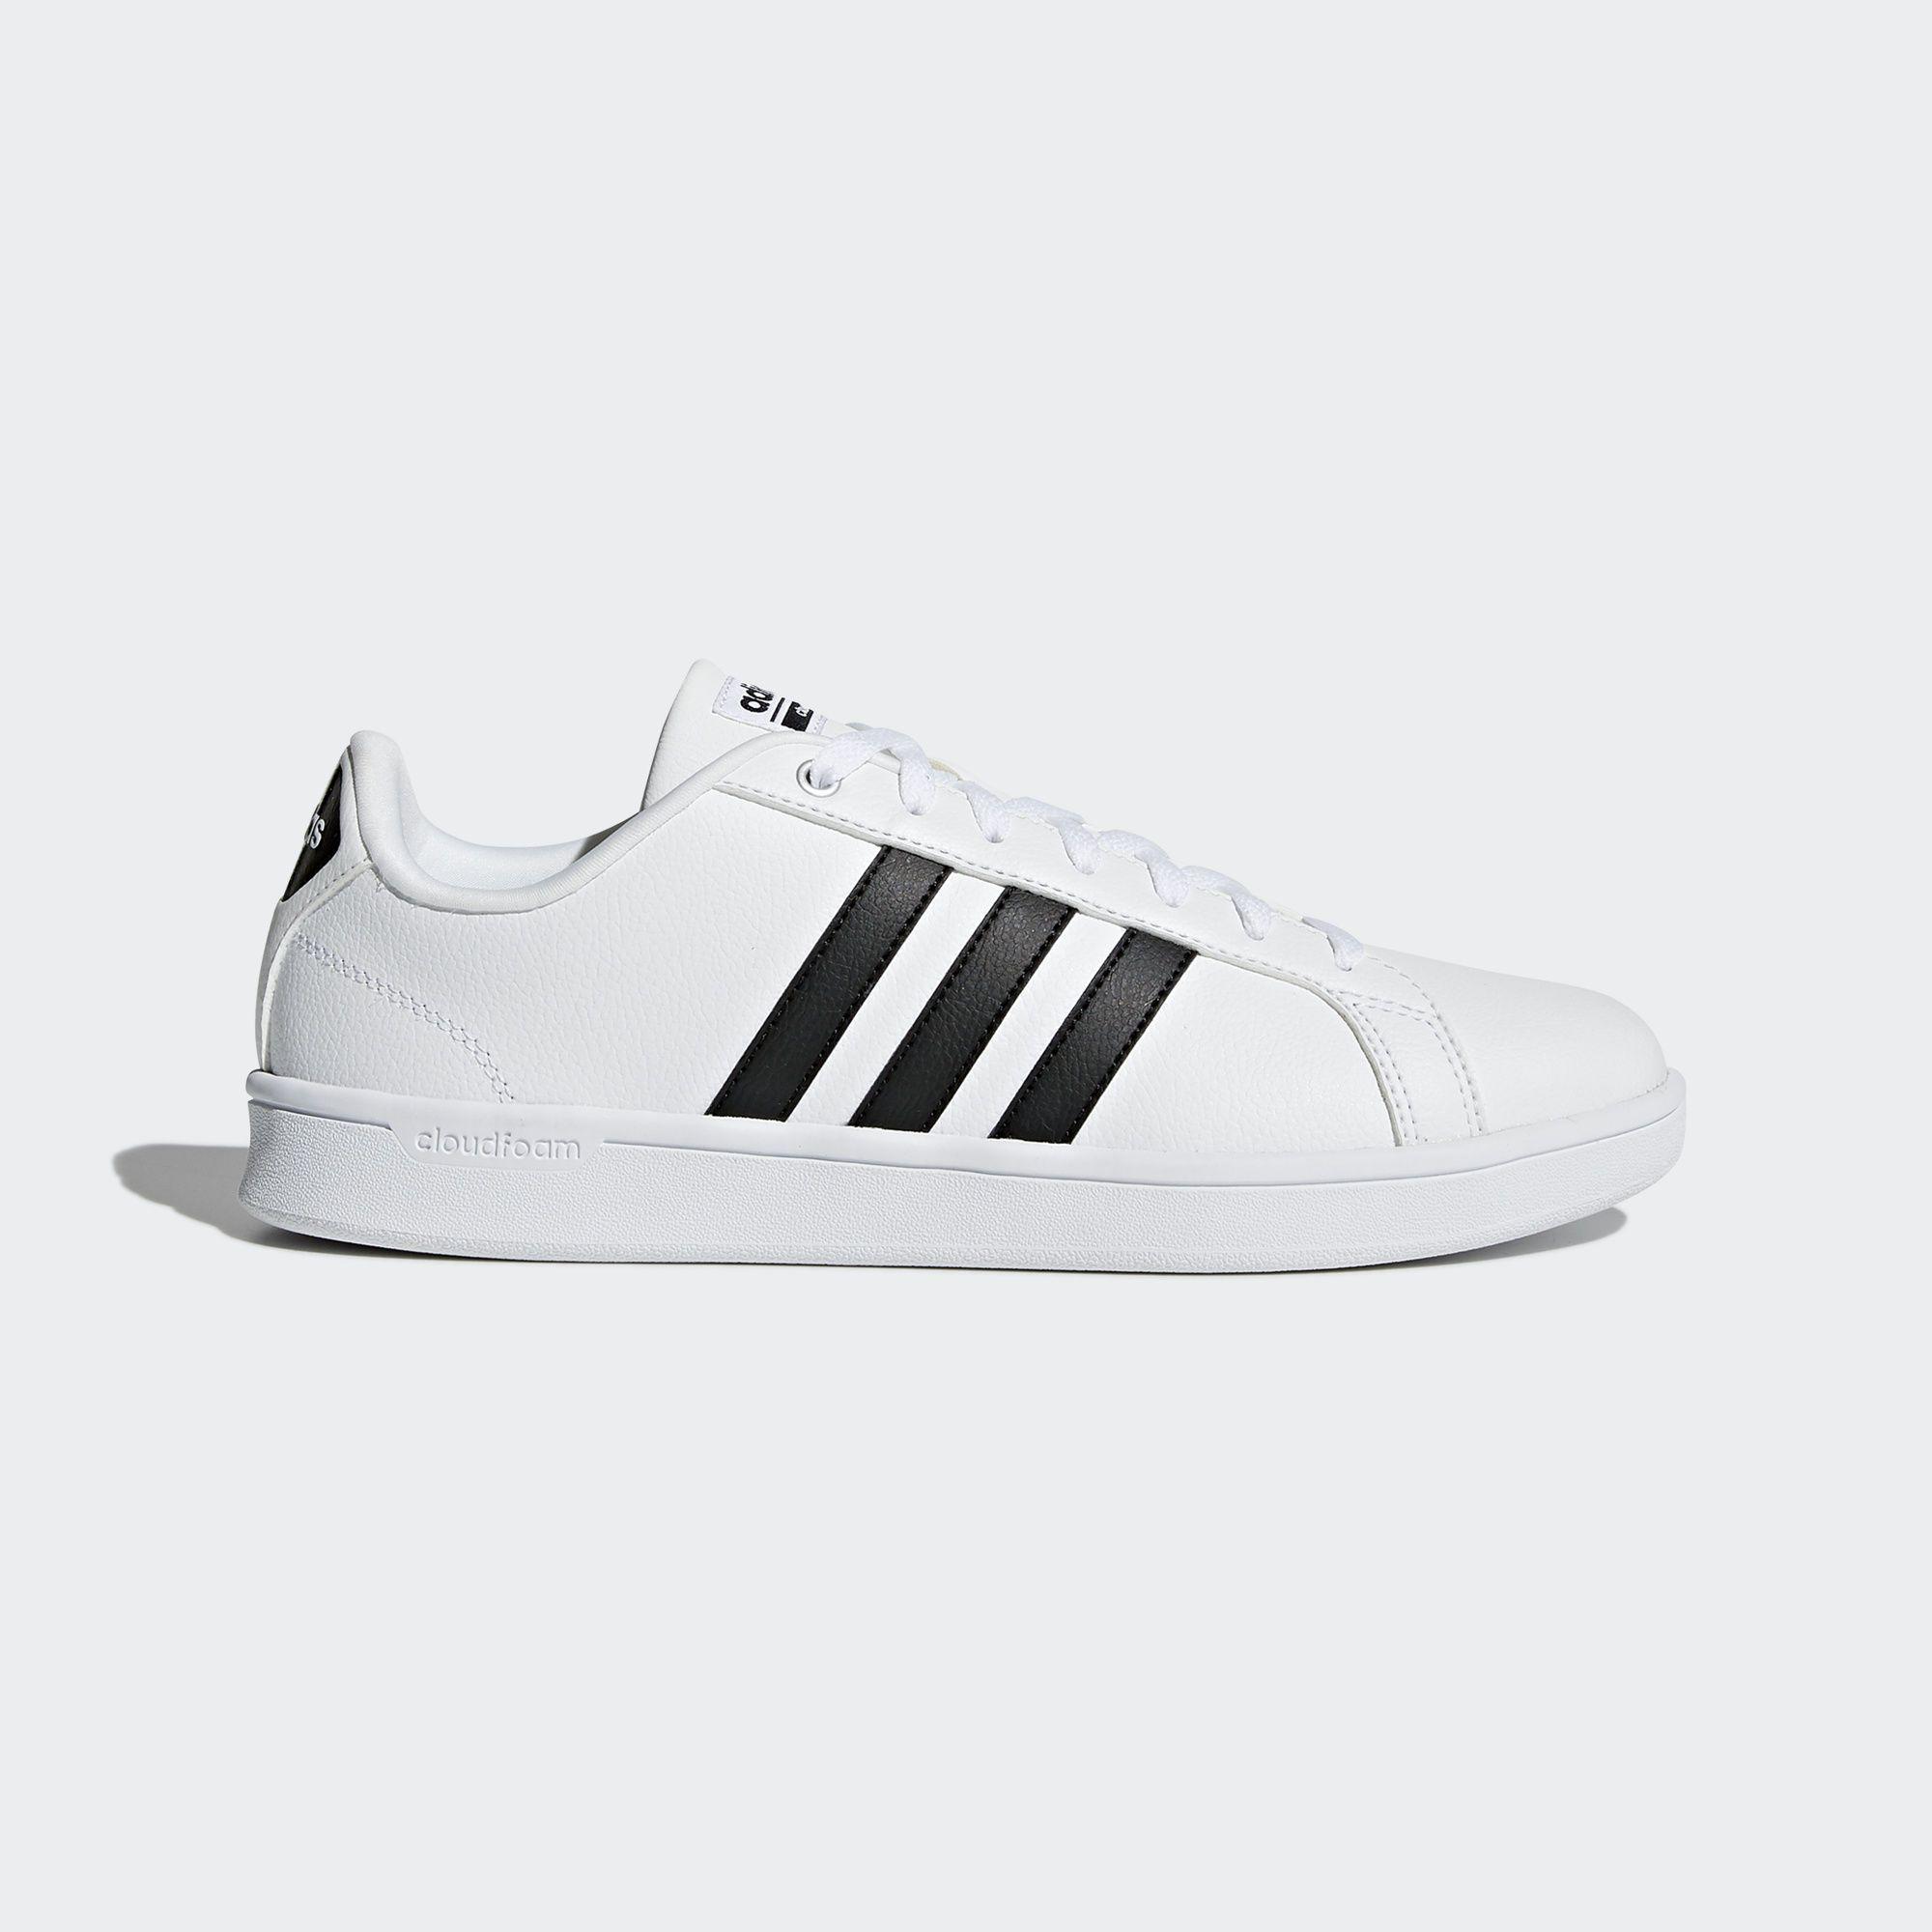 low priced 4cbf9 a2878 adidas sort sko for school